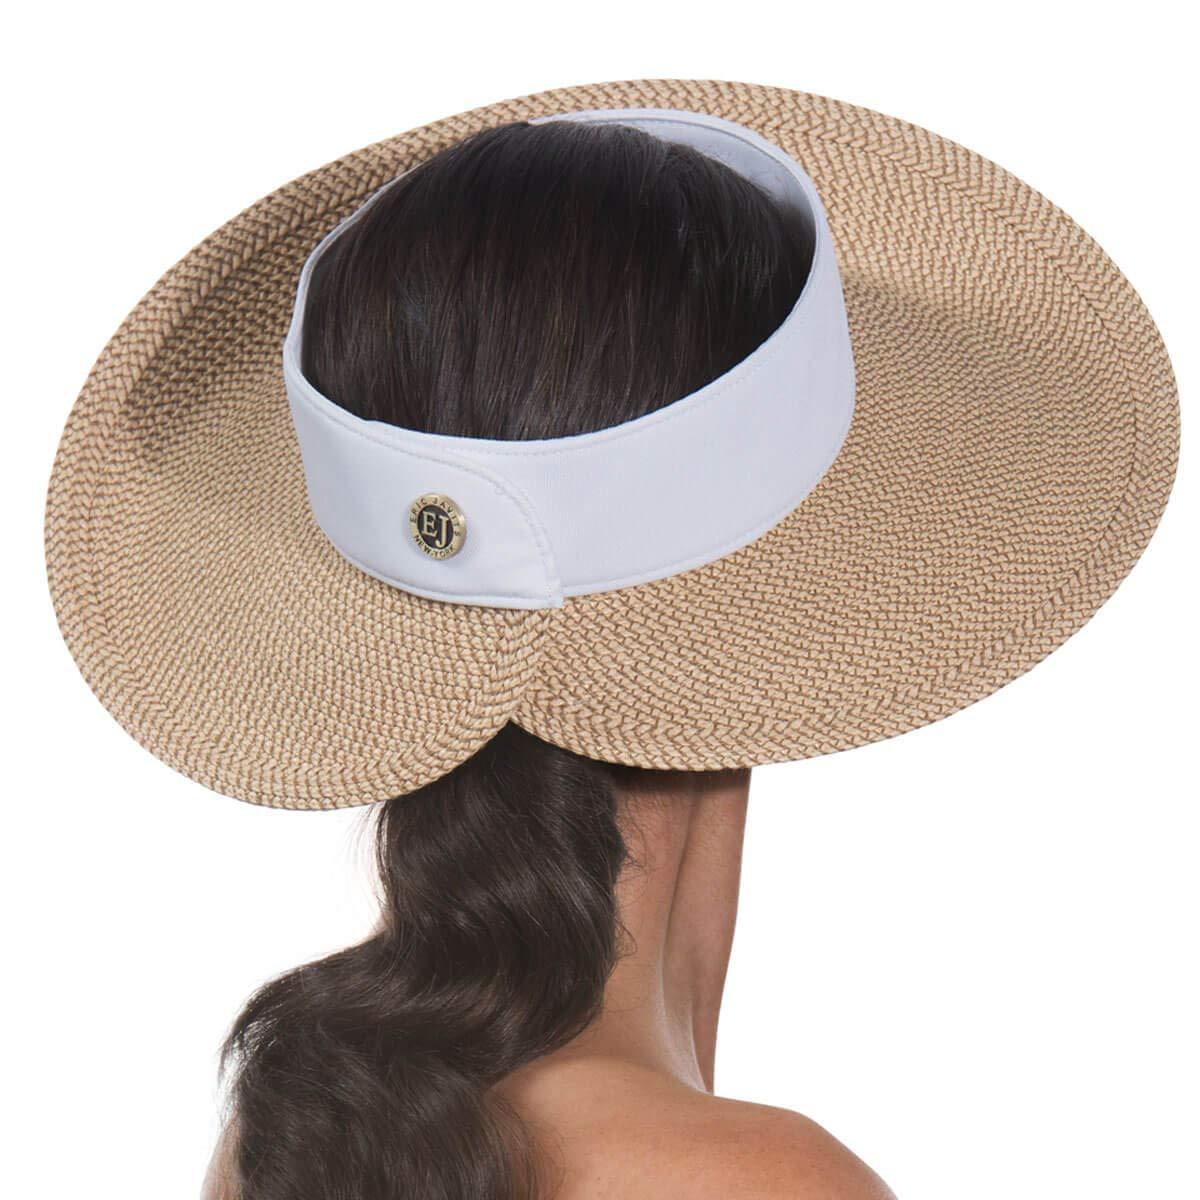 Eric Javits Luxury Women's Designer Headwear Hat - Squishee Halo - Peanut/White by Eric Javits (Image #3)